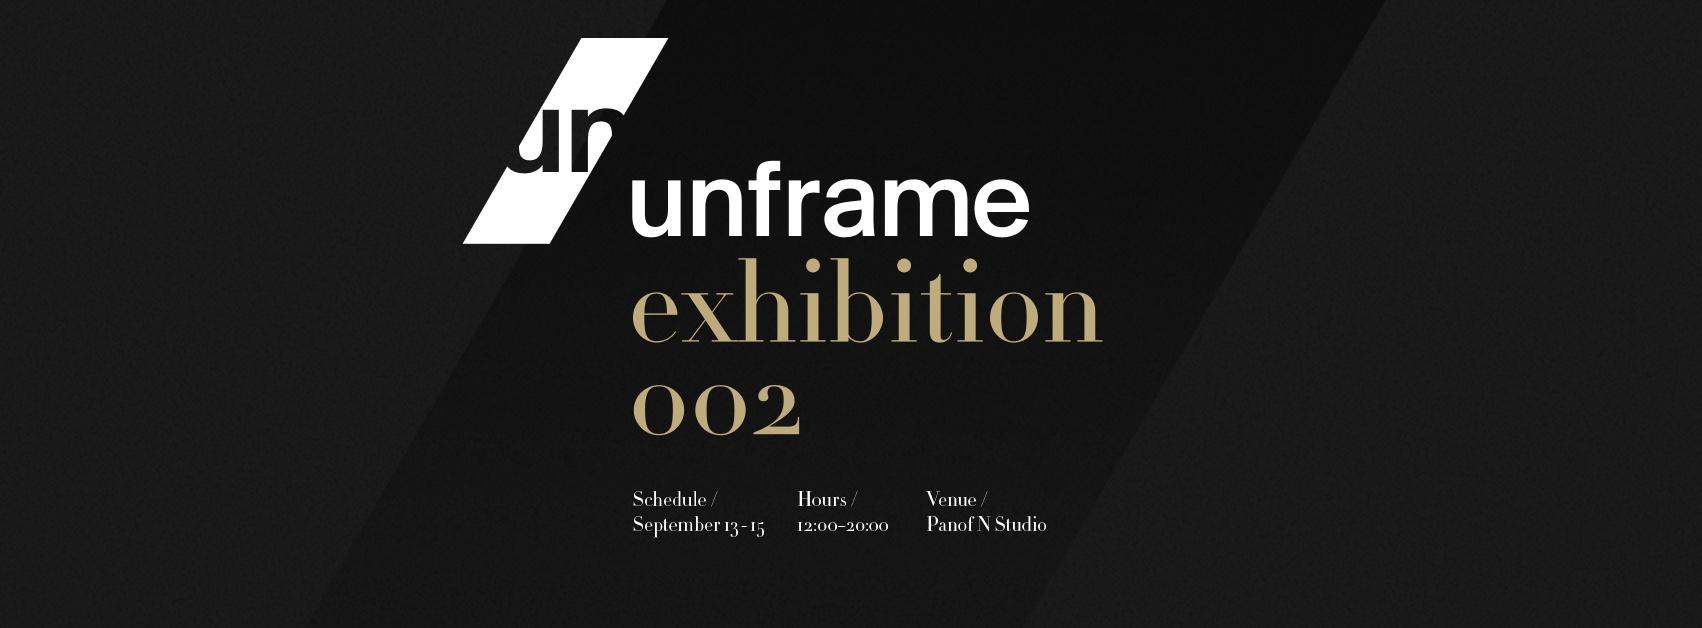 unframe002